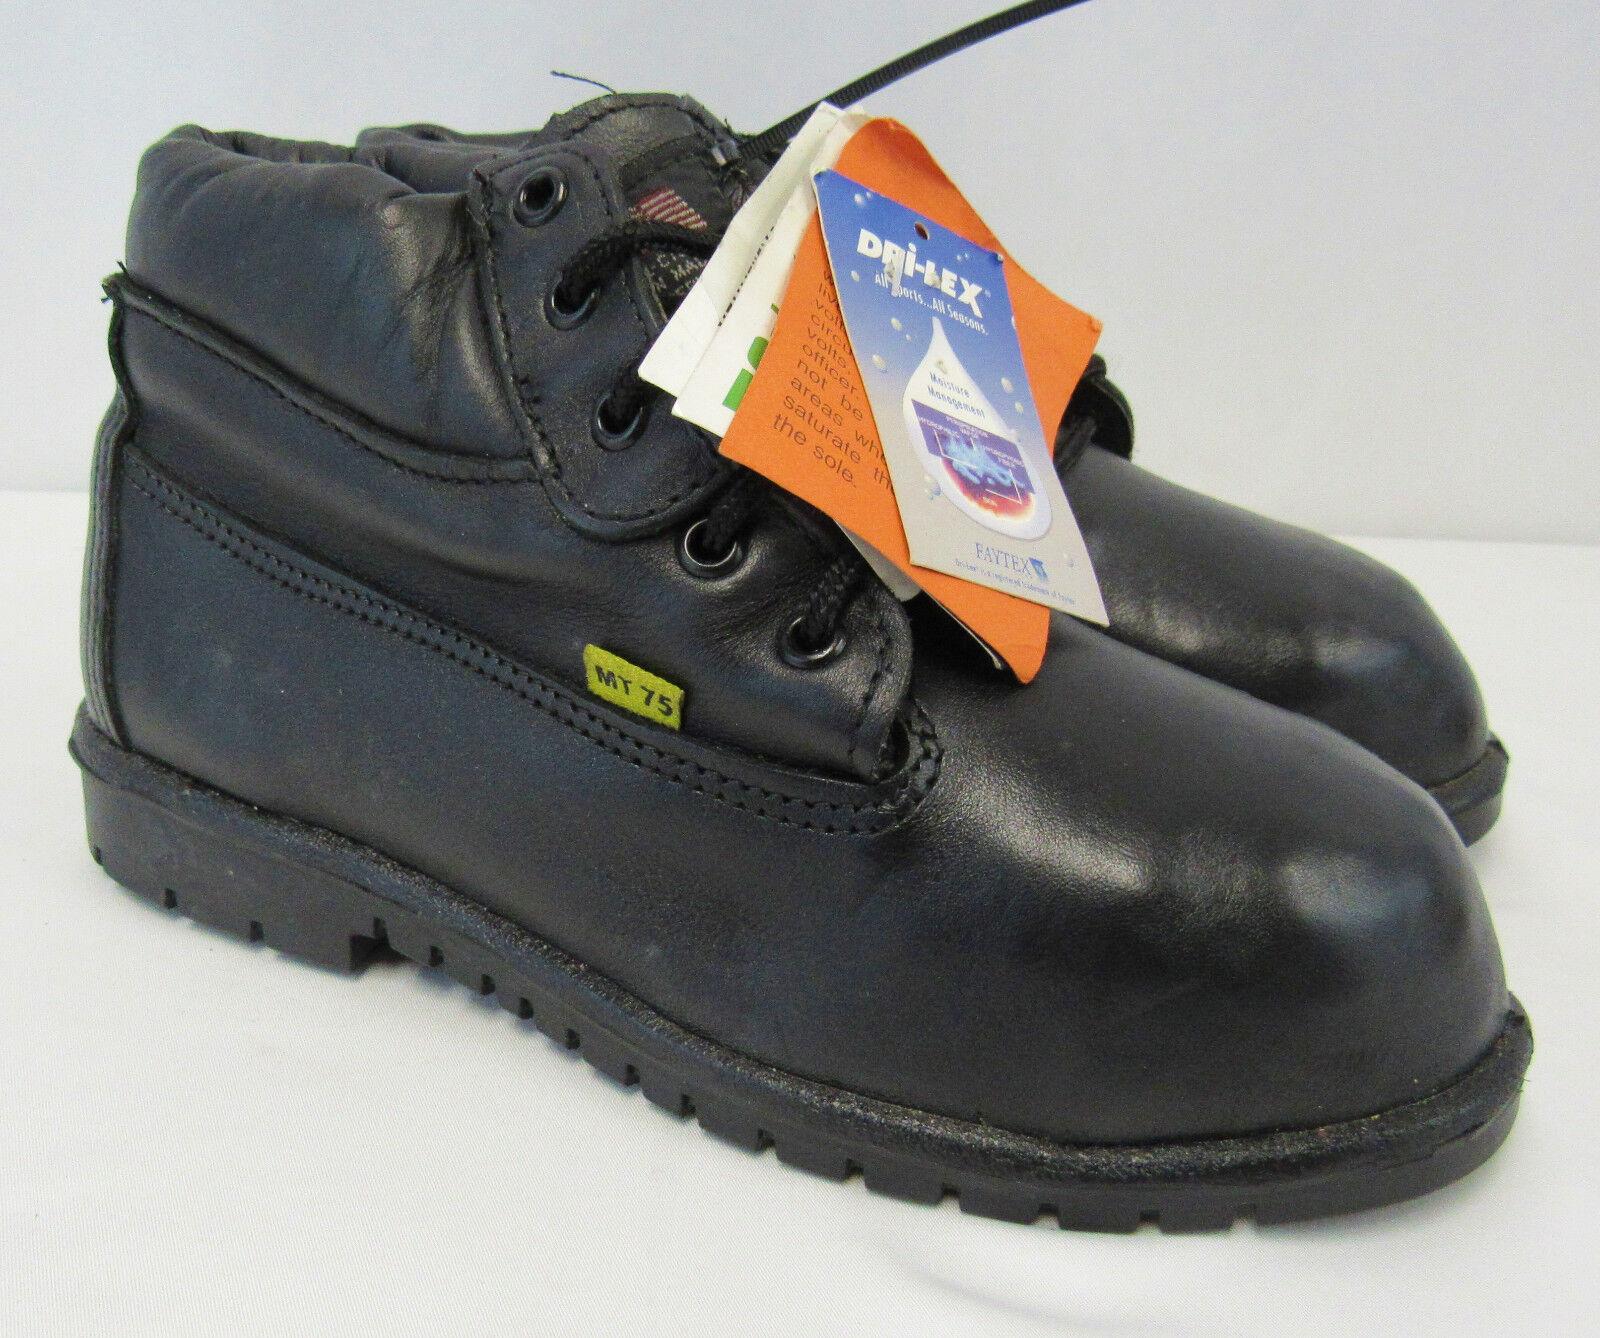 NEW Weinbrenner Aeromet Work Work Work Safety Toe Boots w  Metatarsal Guard Black - Size 6 80abb4